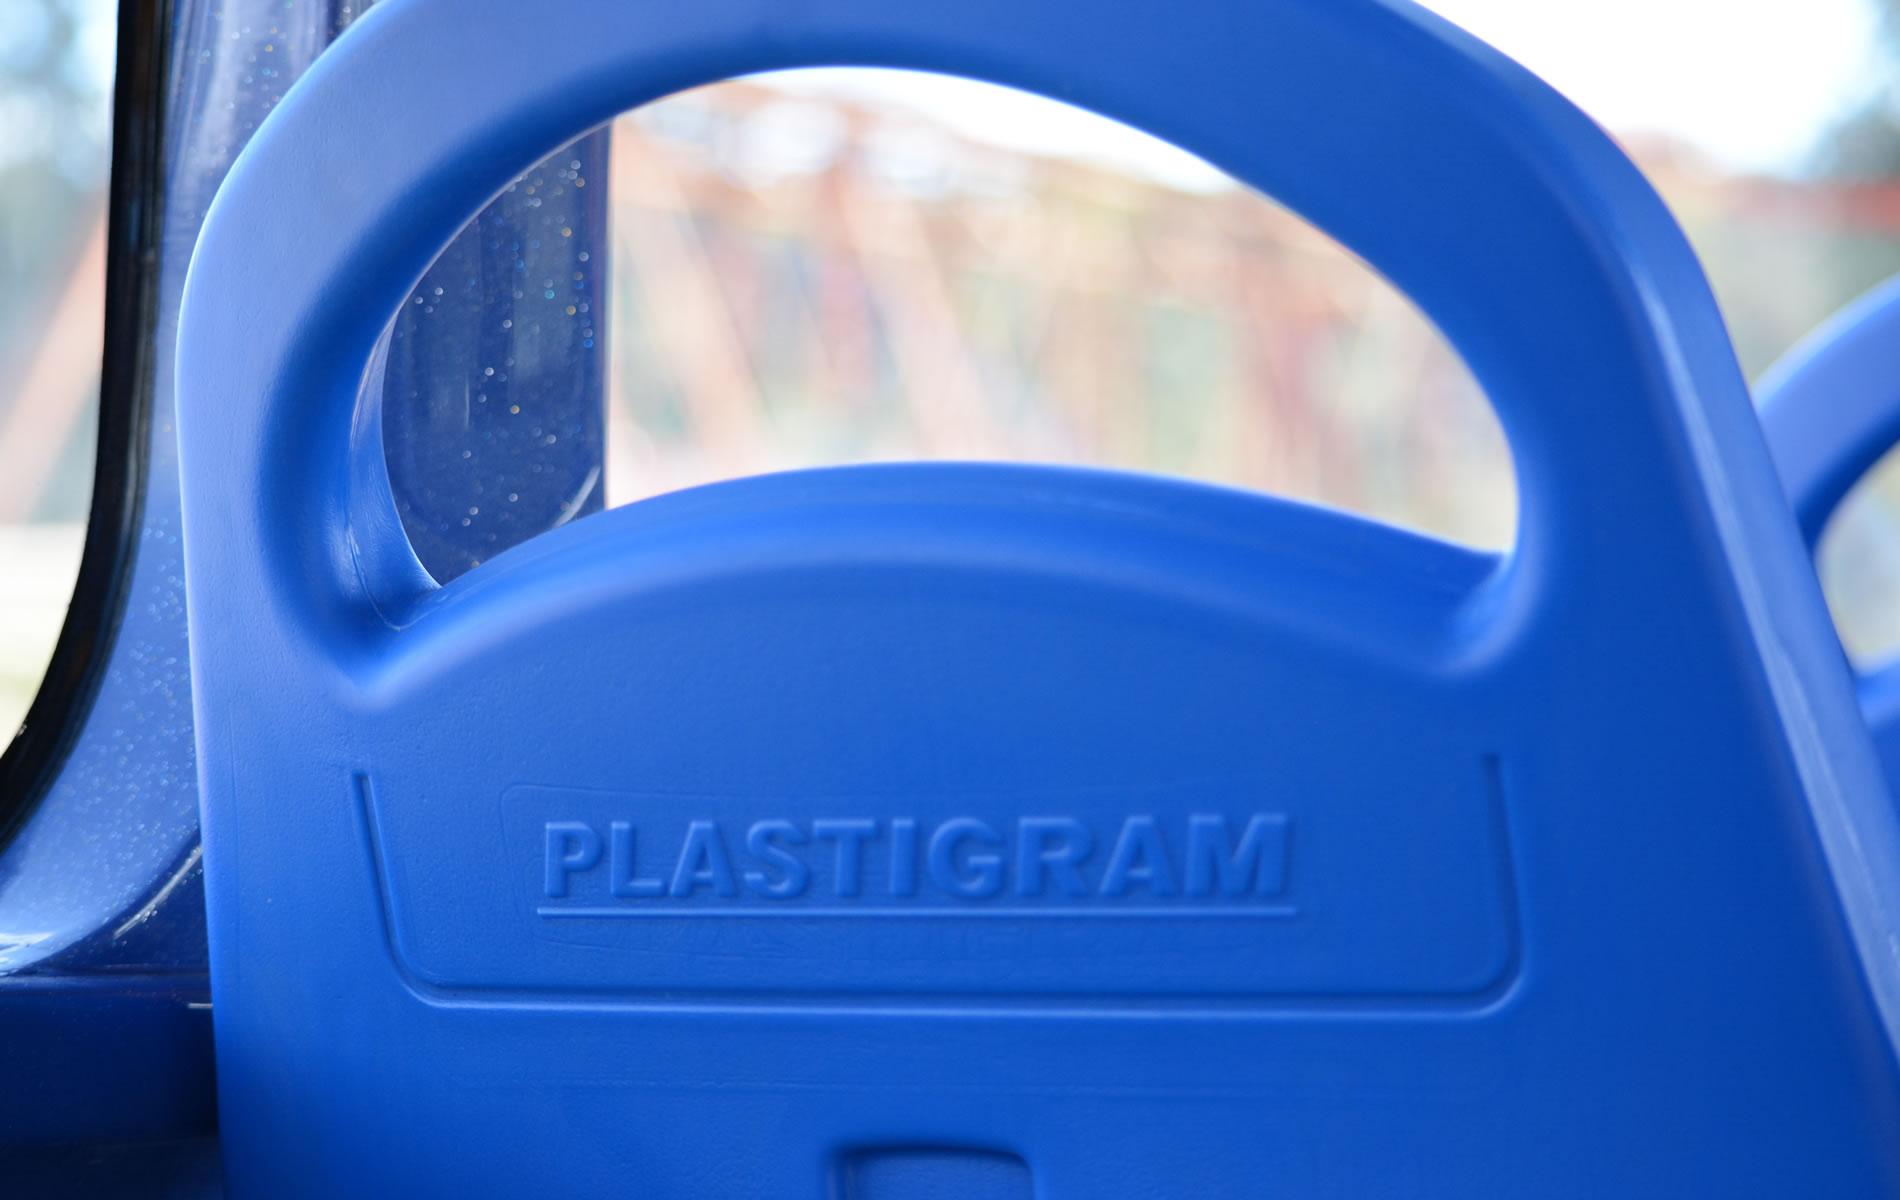 Plastigram